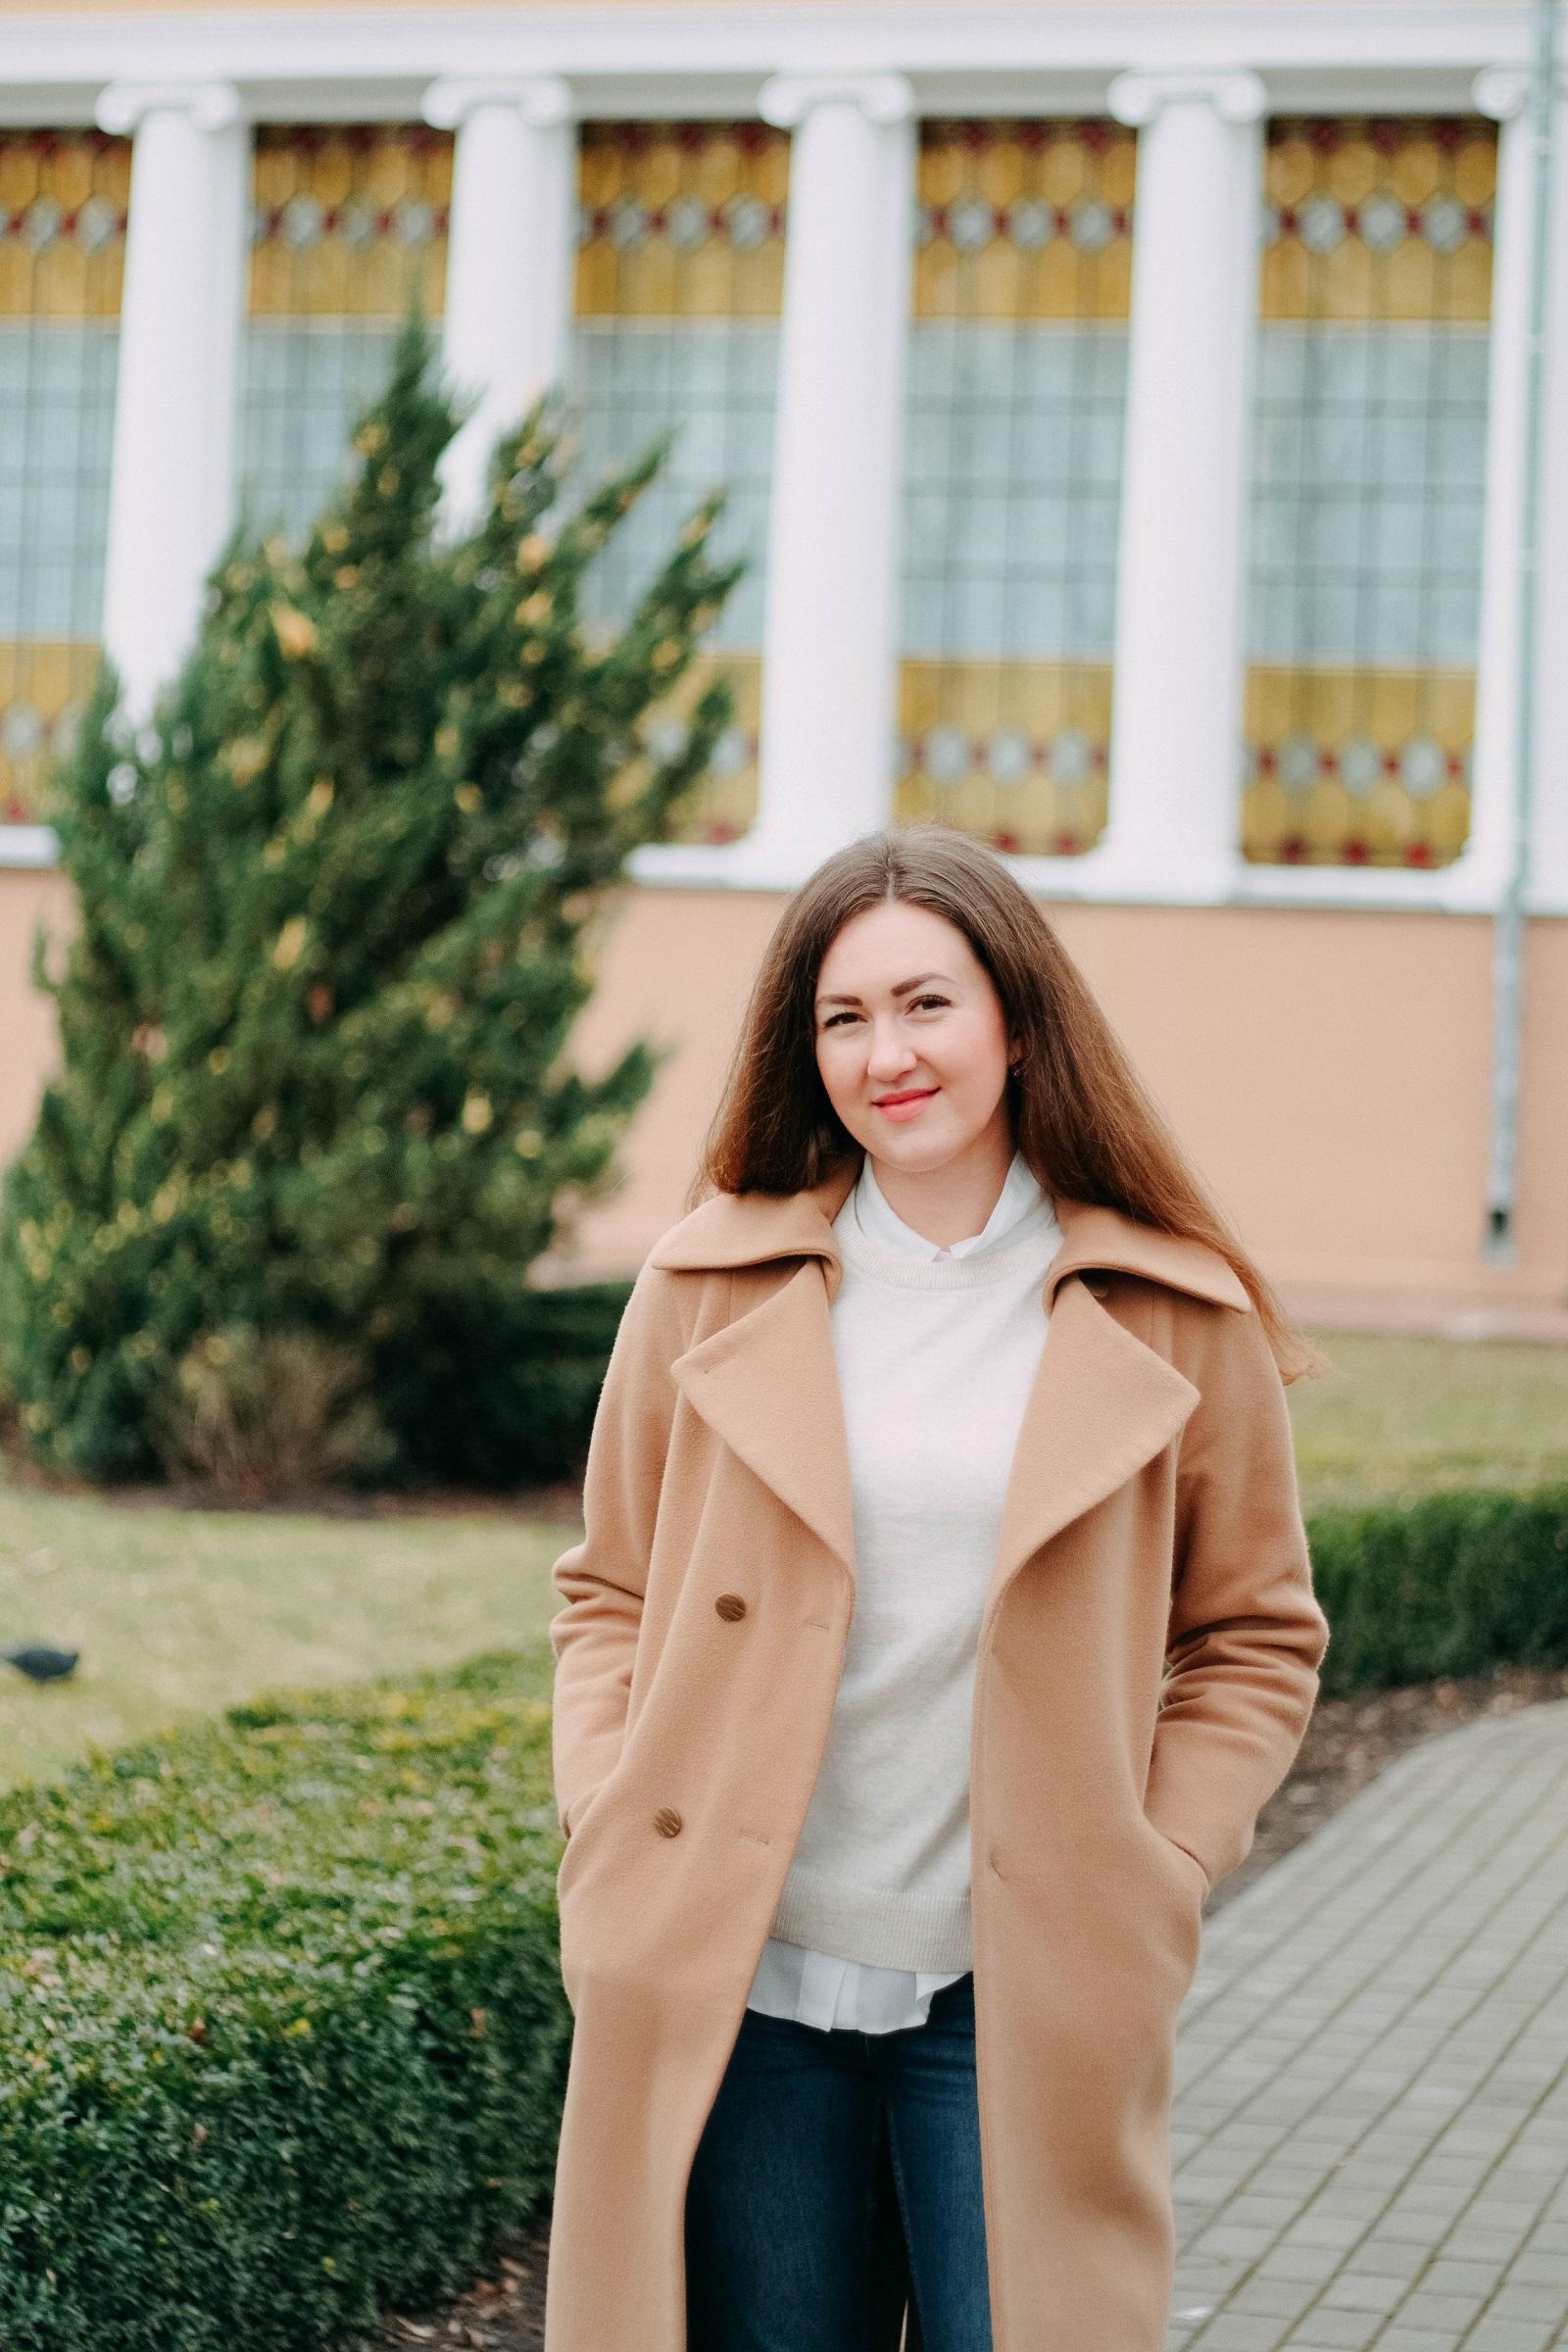 IMG 0460 16 03 20 11 09 - Вероника Даниленко